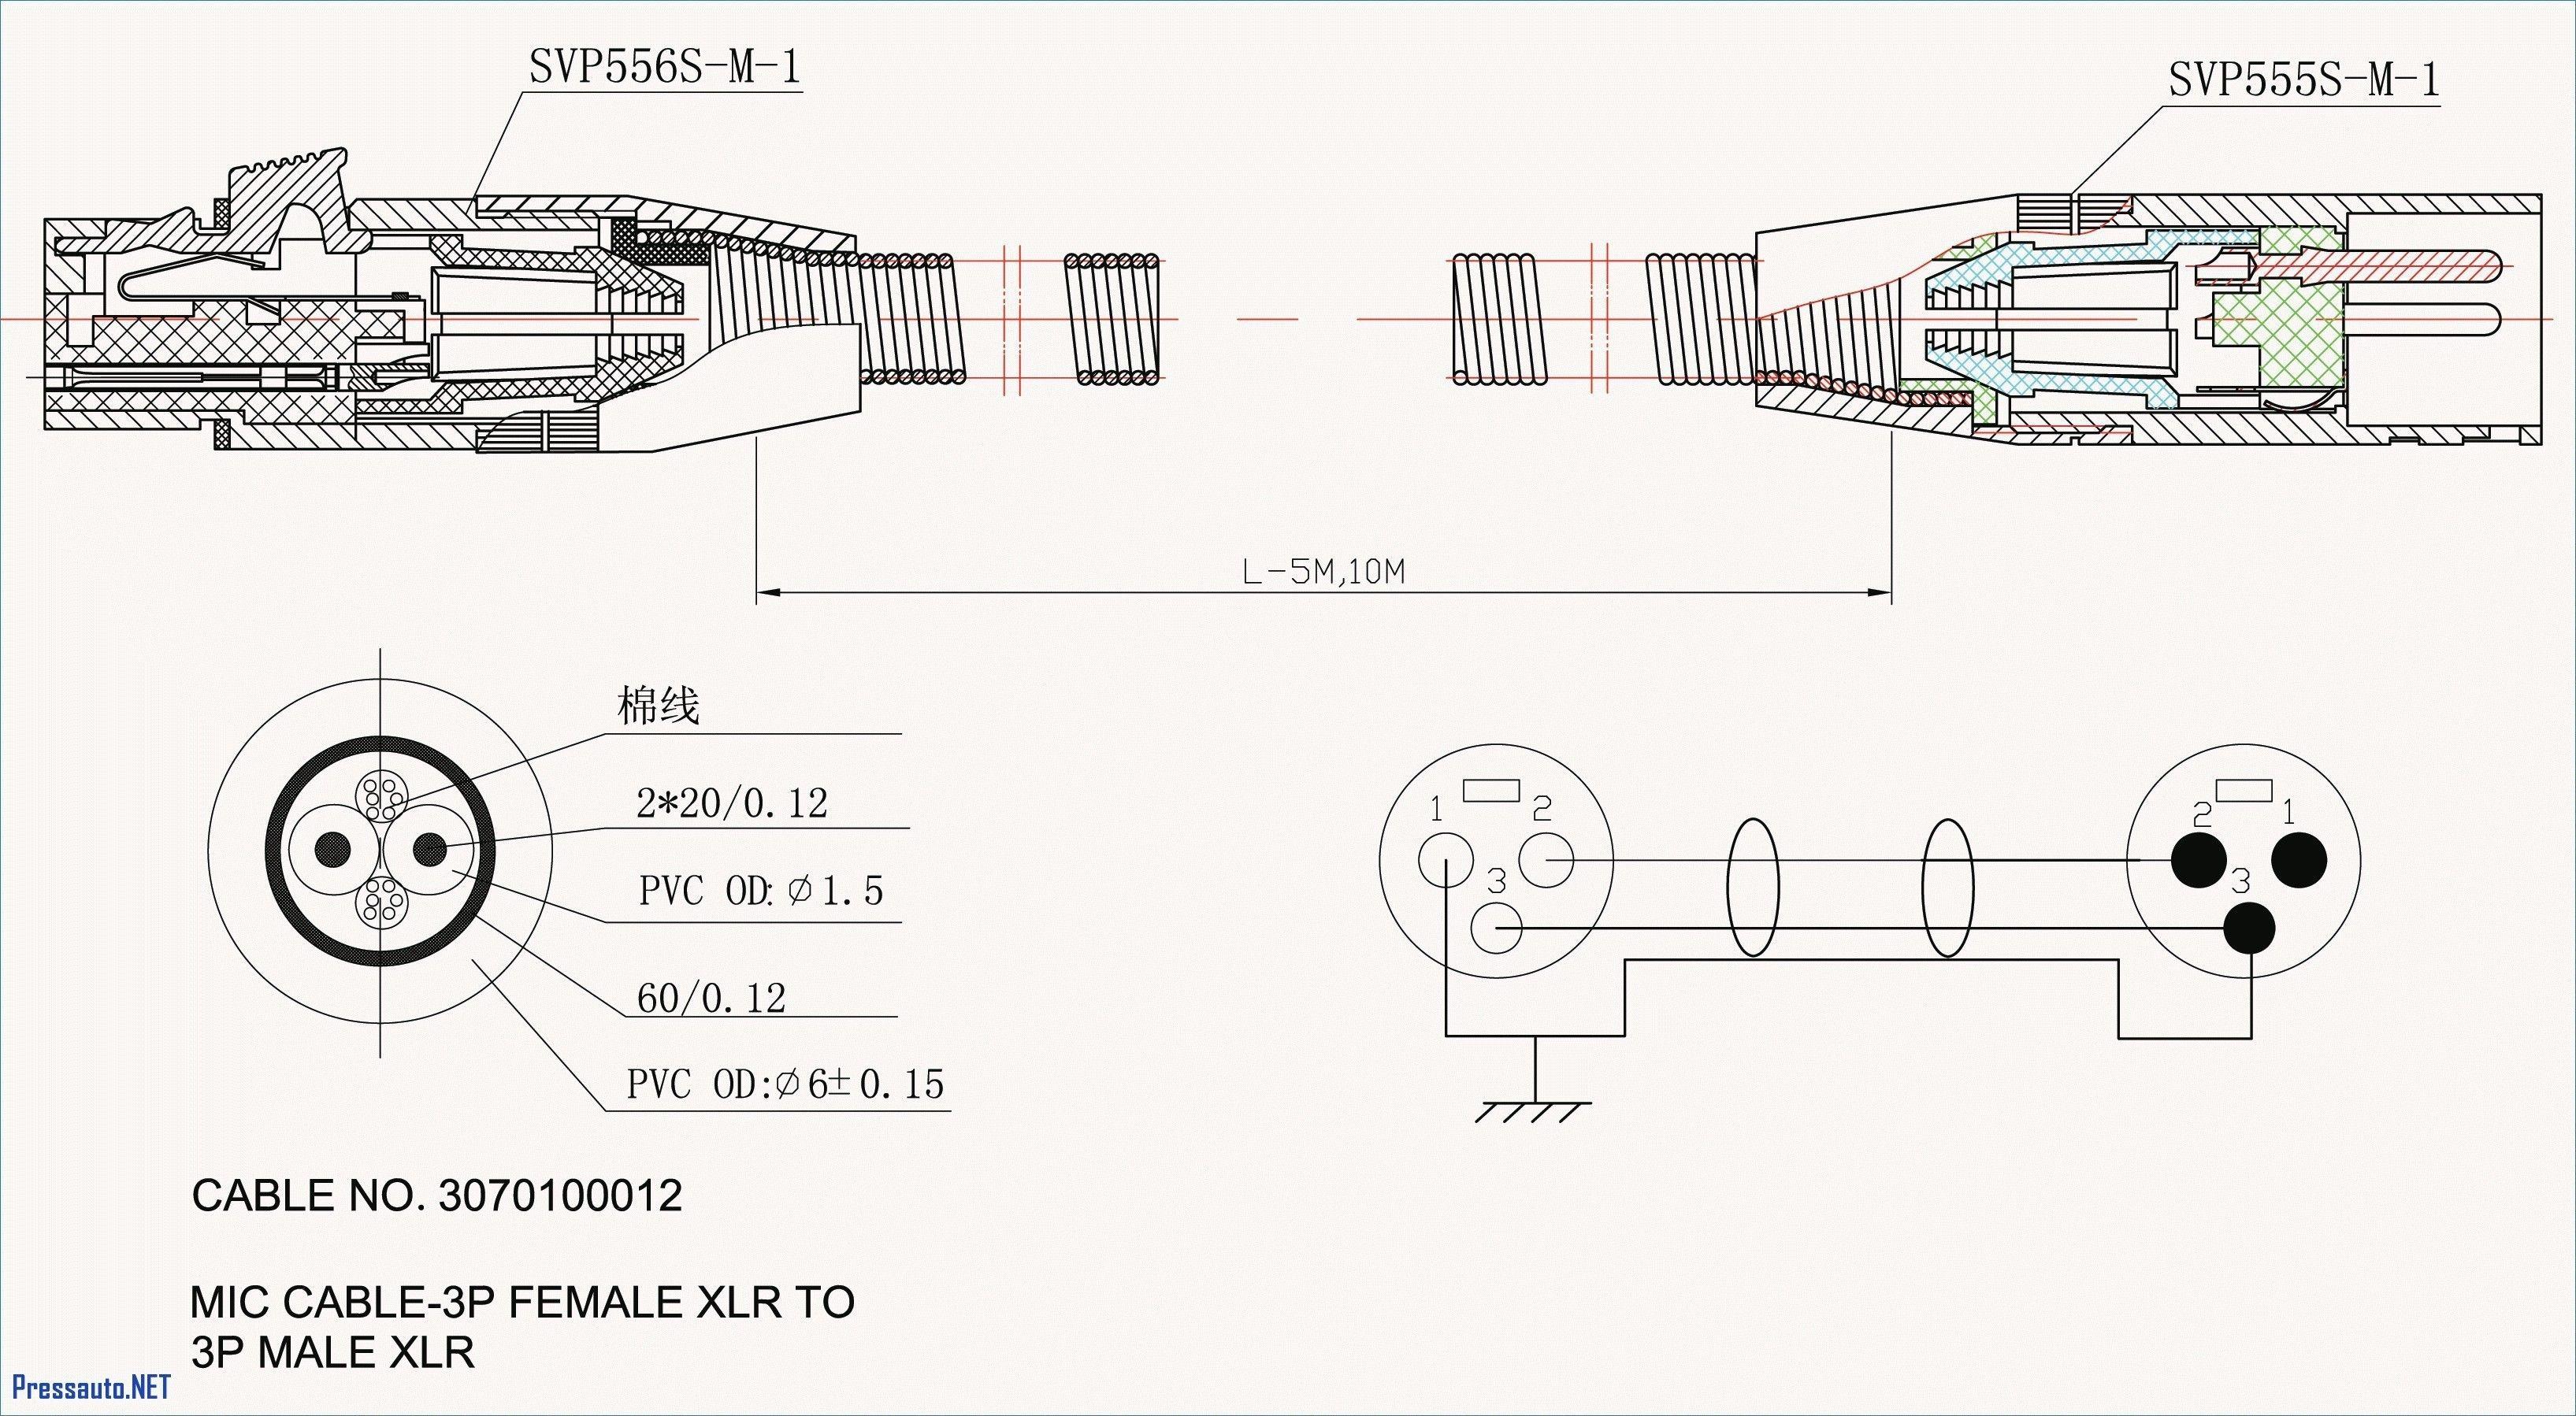 2001 Toyota Corolla Engine Diagram Electrical Wiring Diagram Trailer Wiring Diagram Alternator